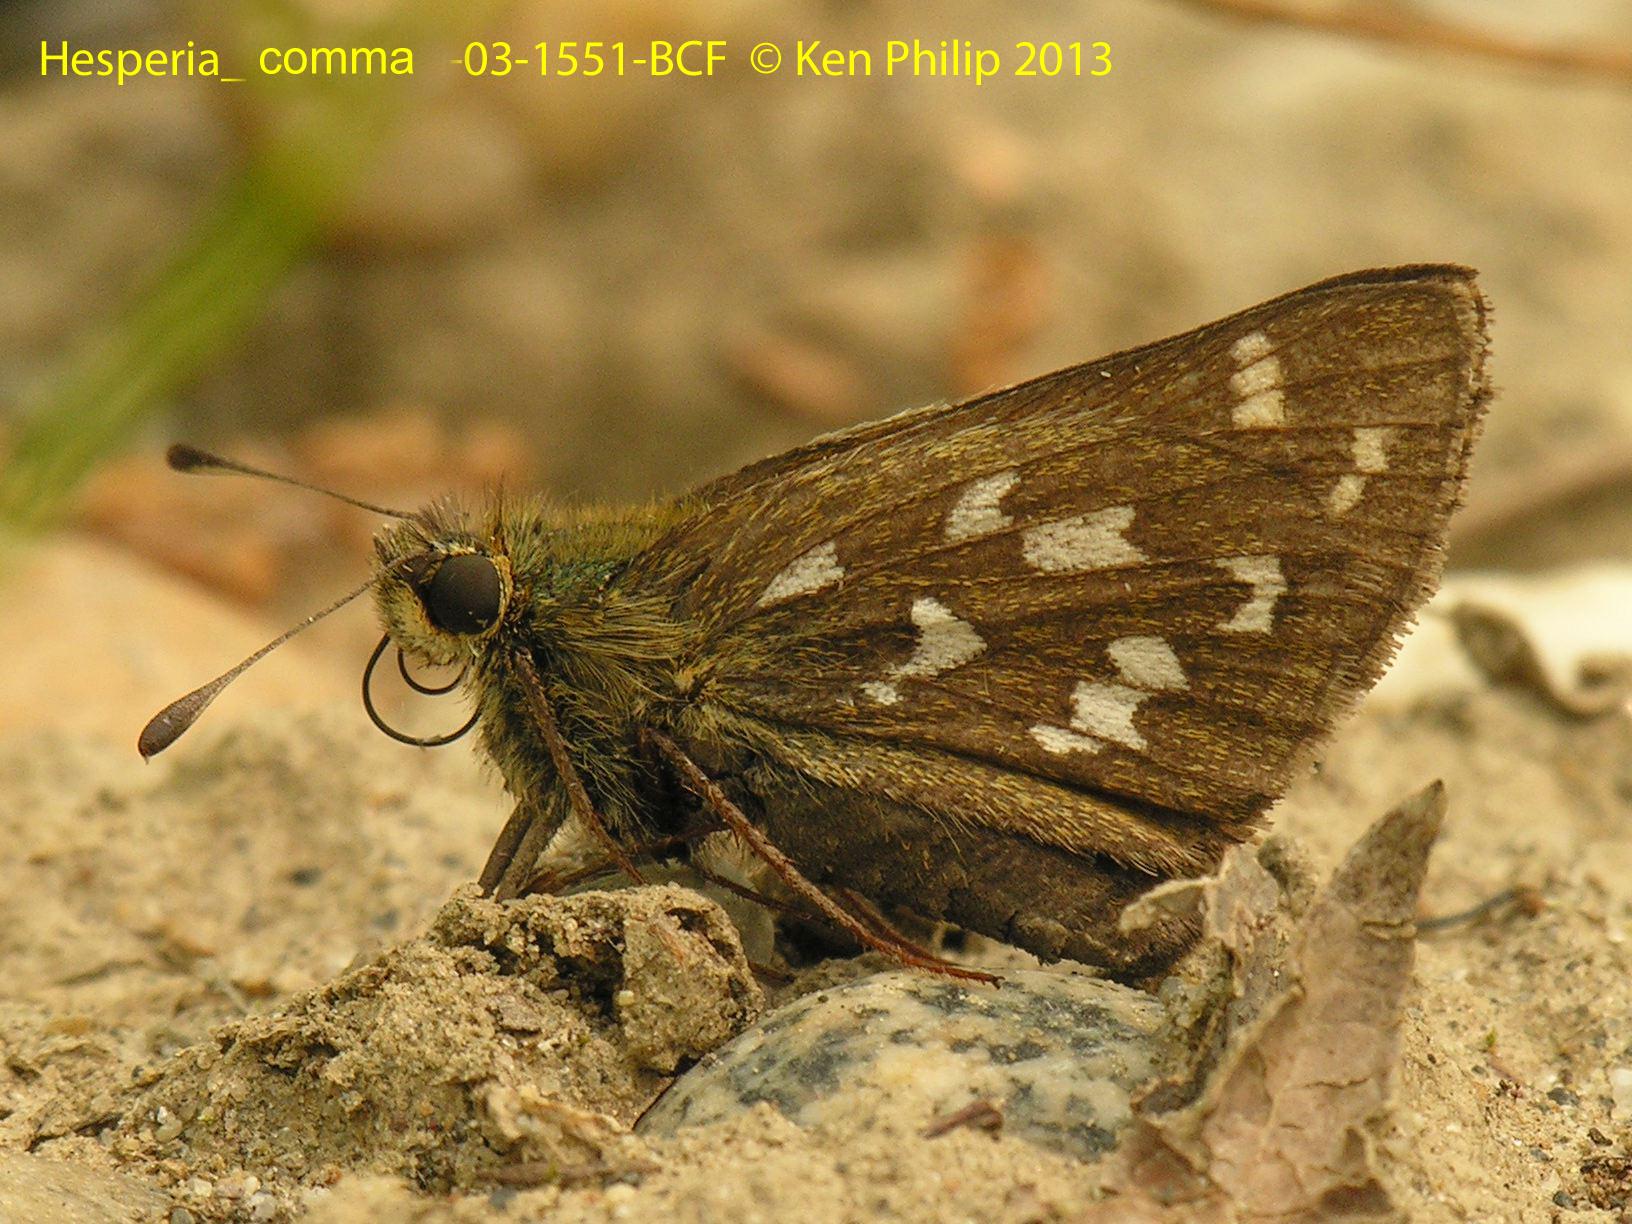 04-Hesperia_comma-03-1551-BCF